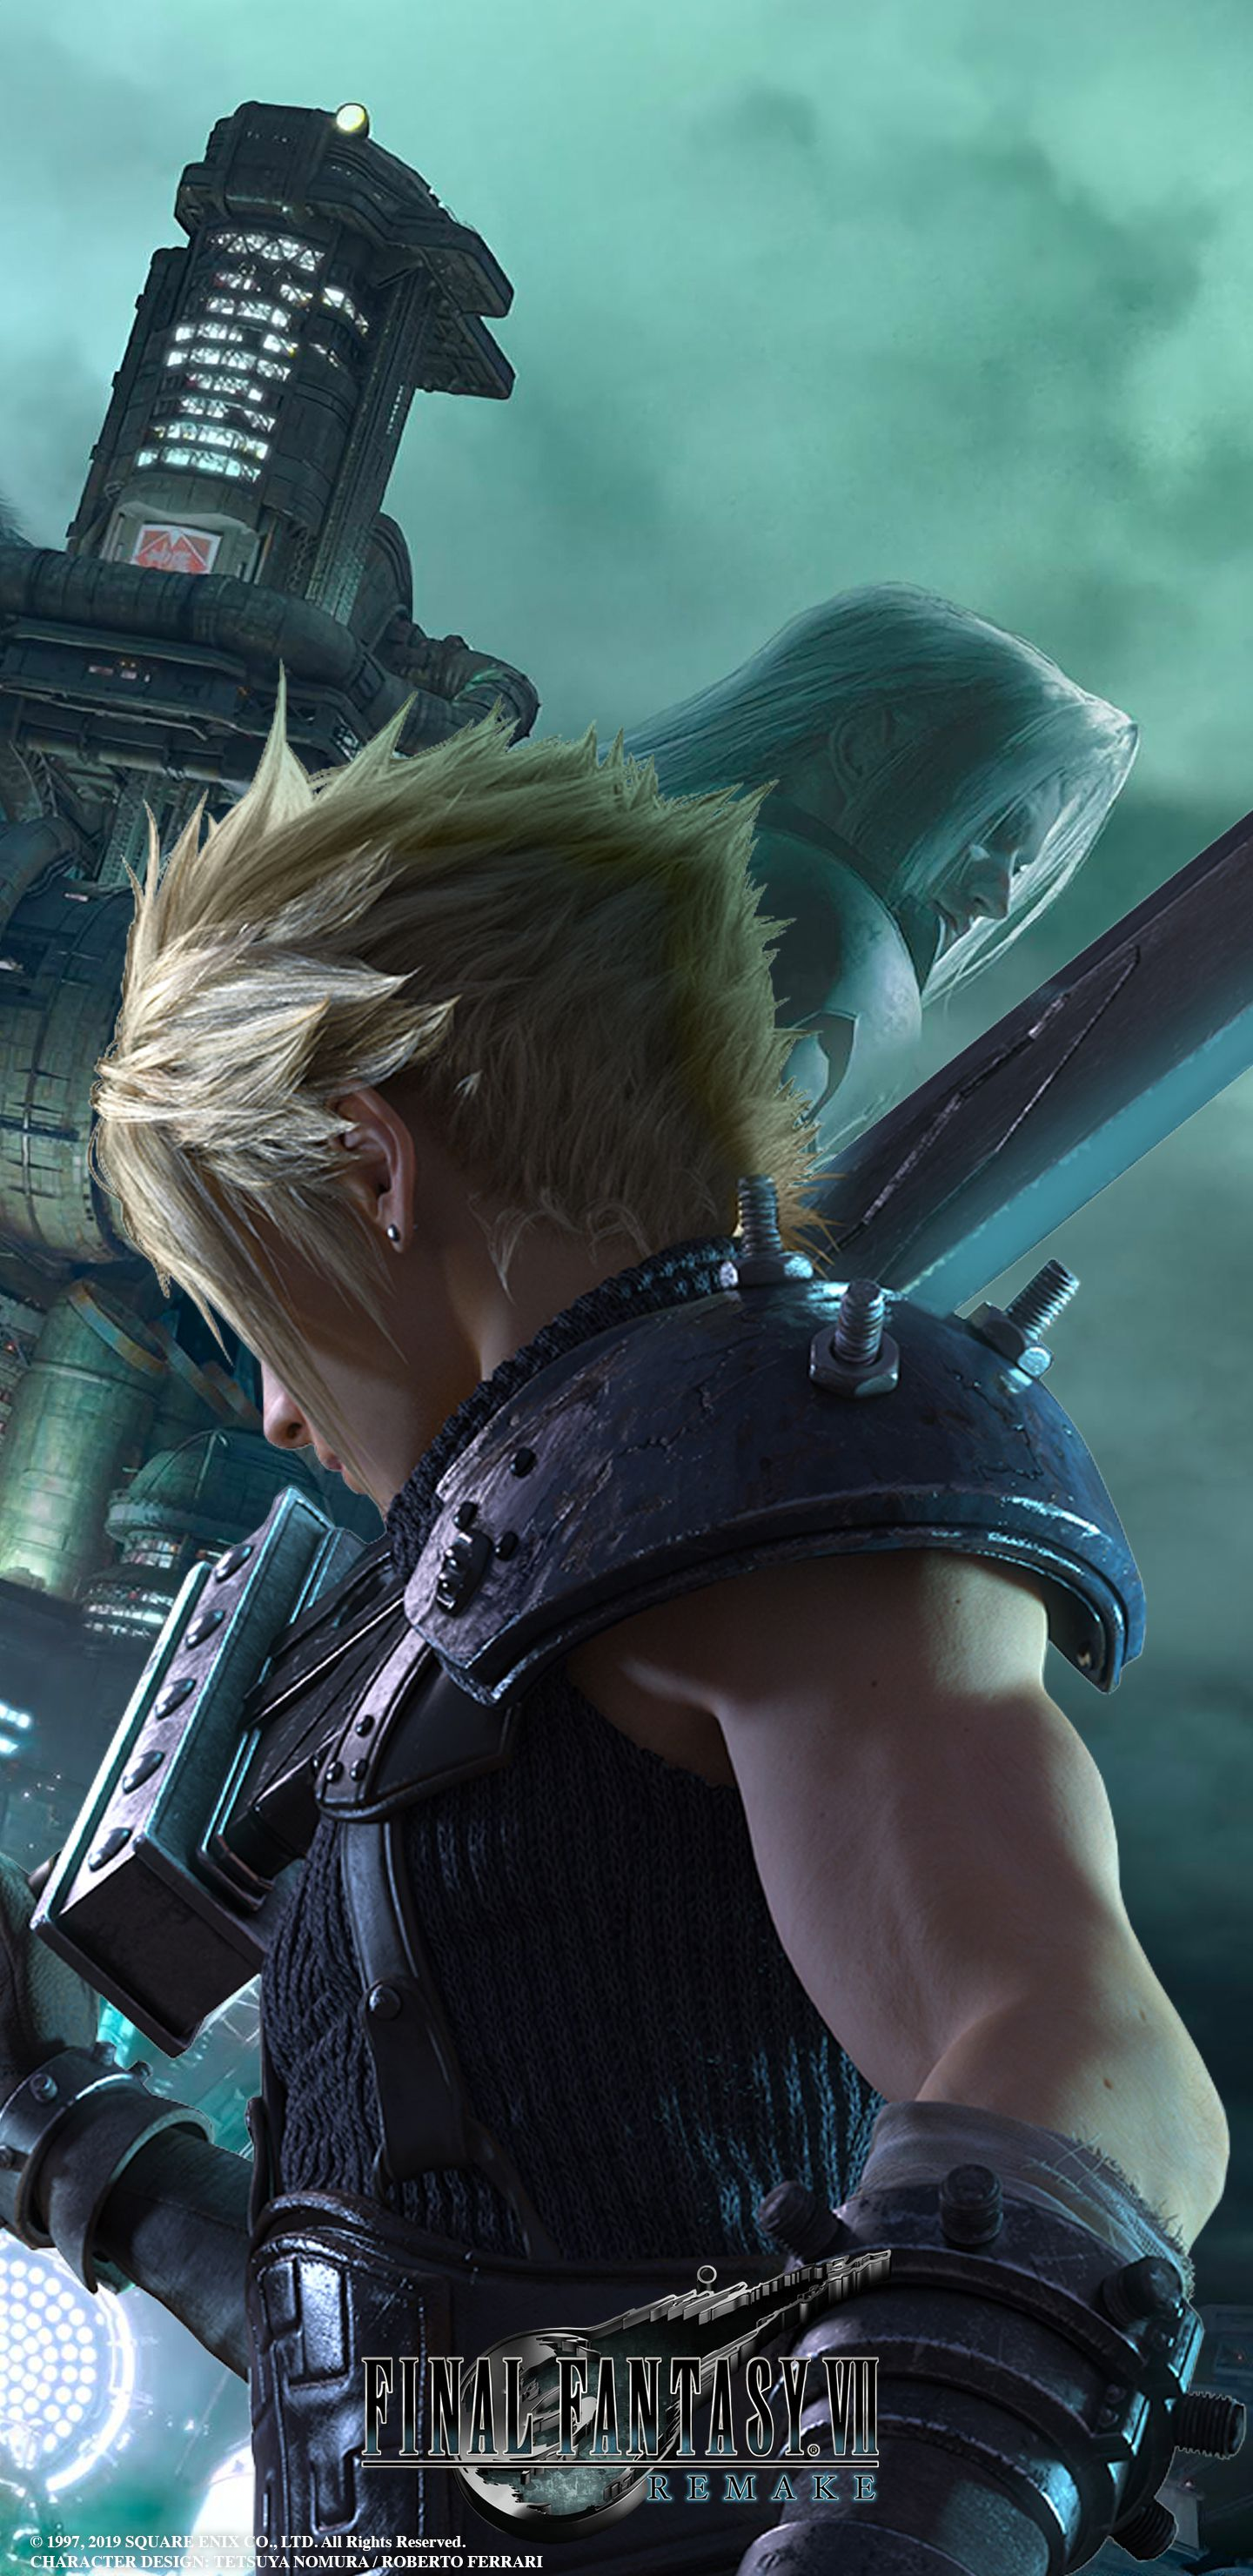 Final Fantasy Vii Remake クラウド ストライフ Ff7 クラウド Ff 壁紙